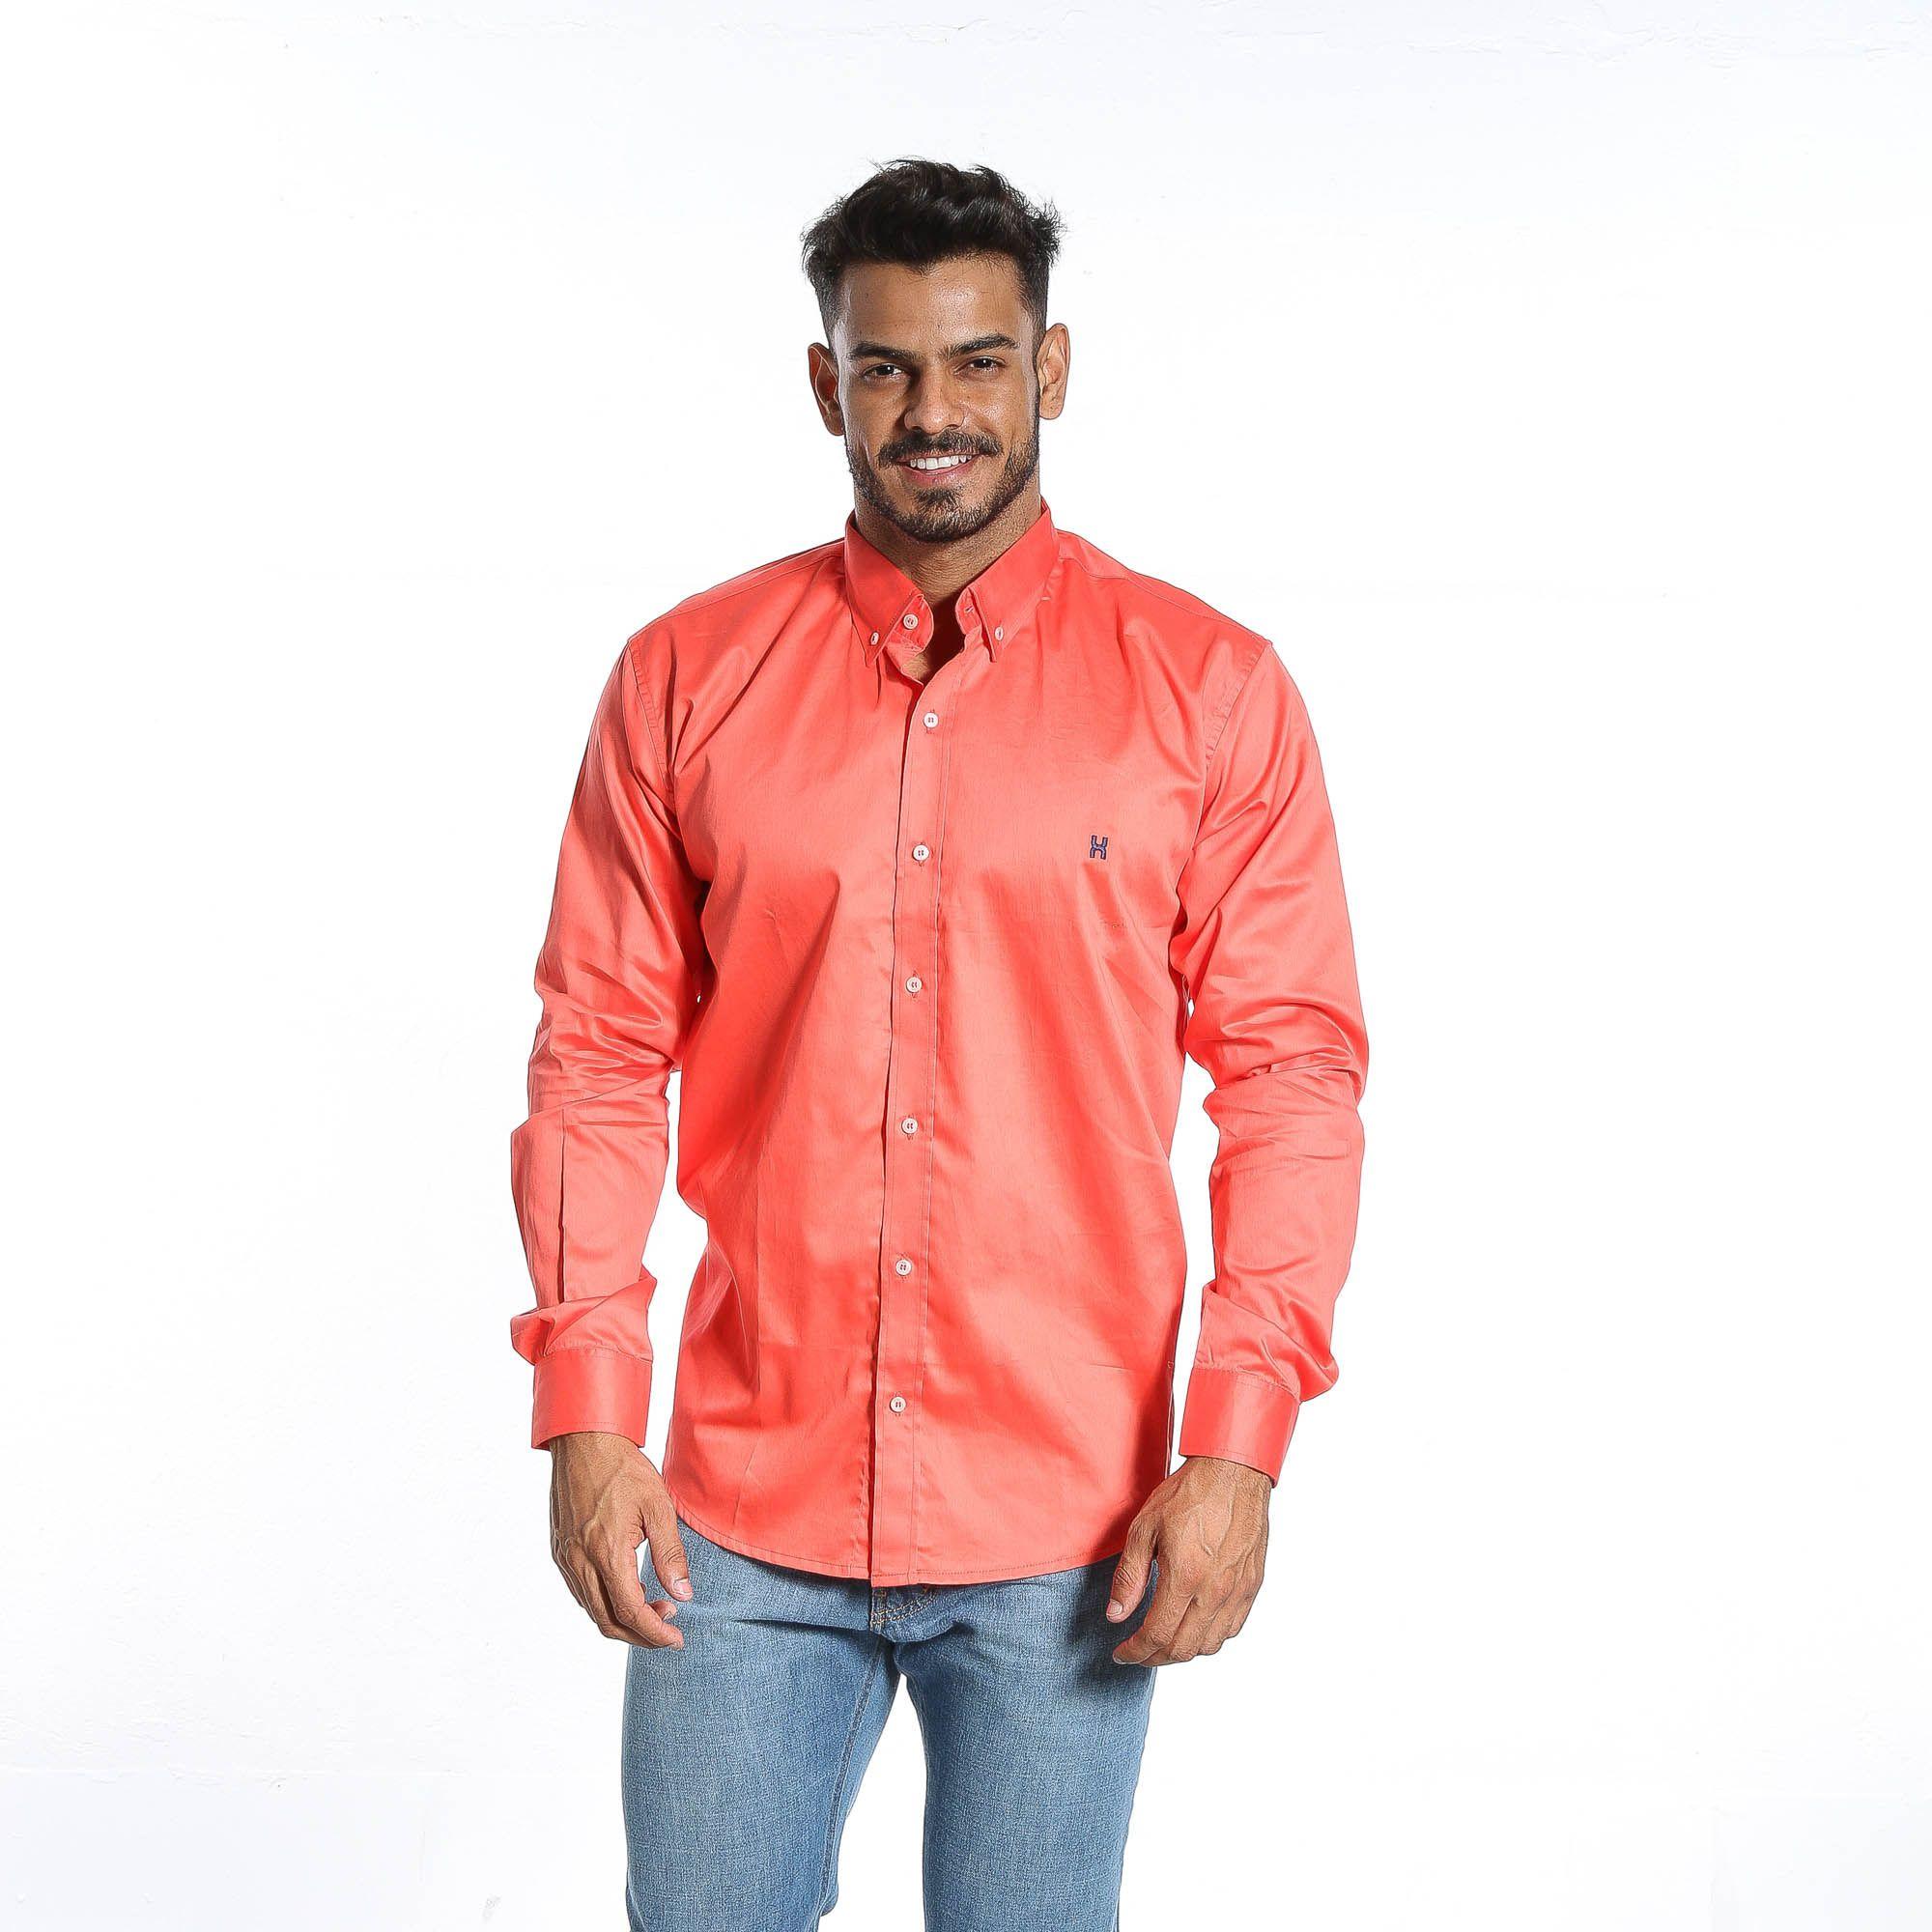 Camisa Masculina TXC 2332